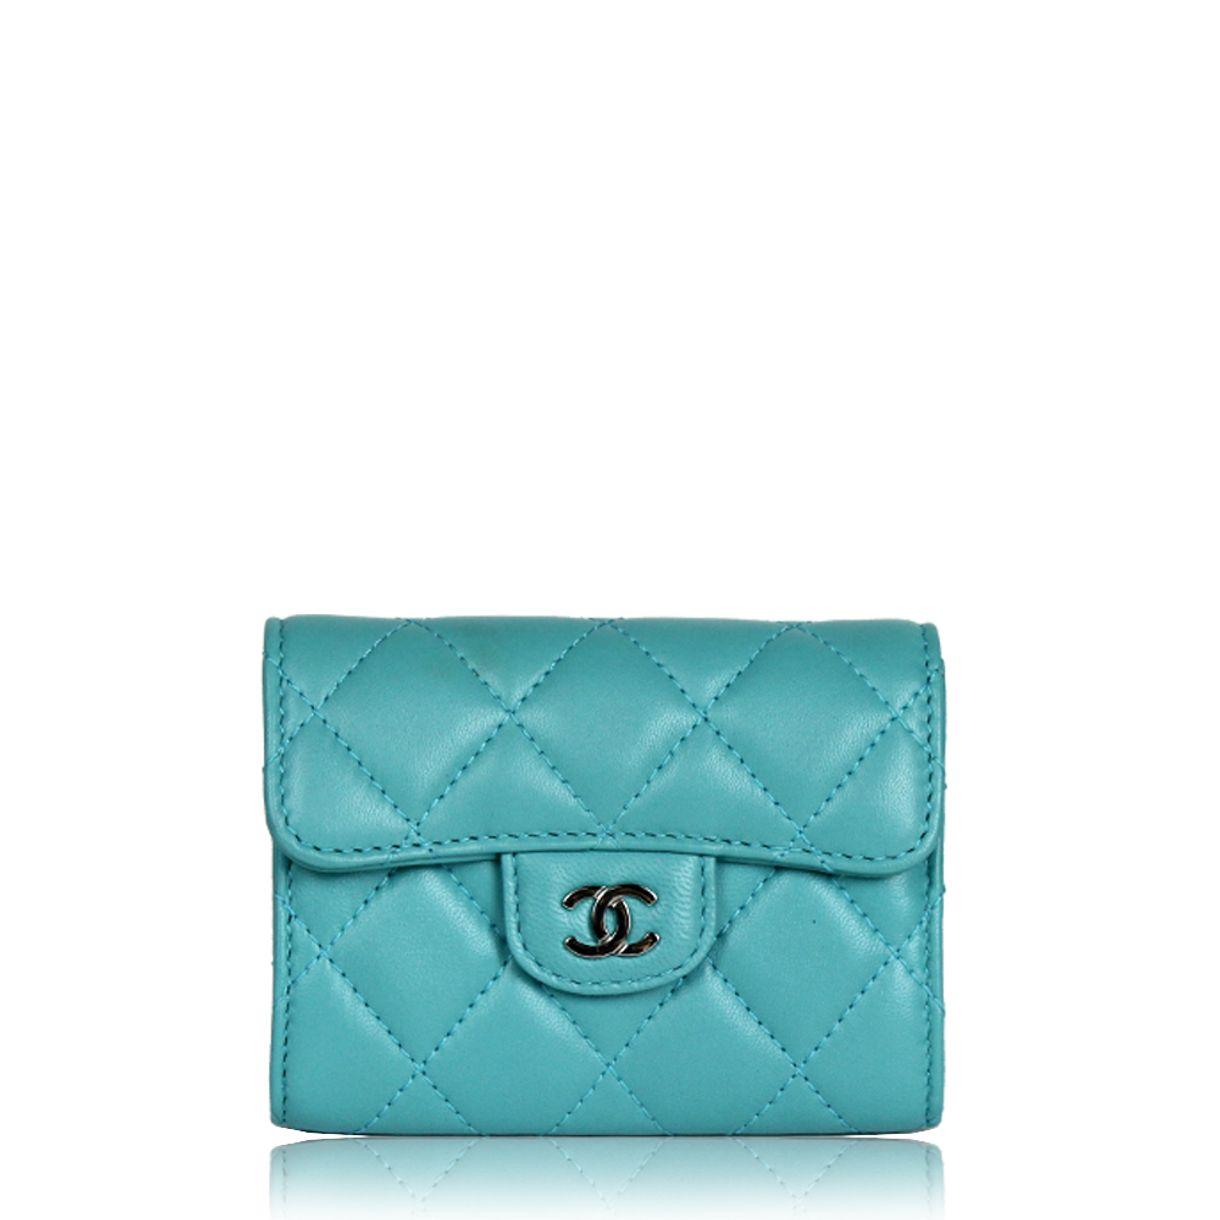 carteira-chanel-small-zip--pocket-turquesa